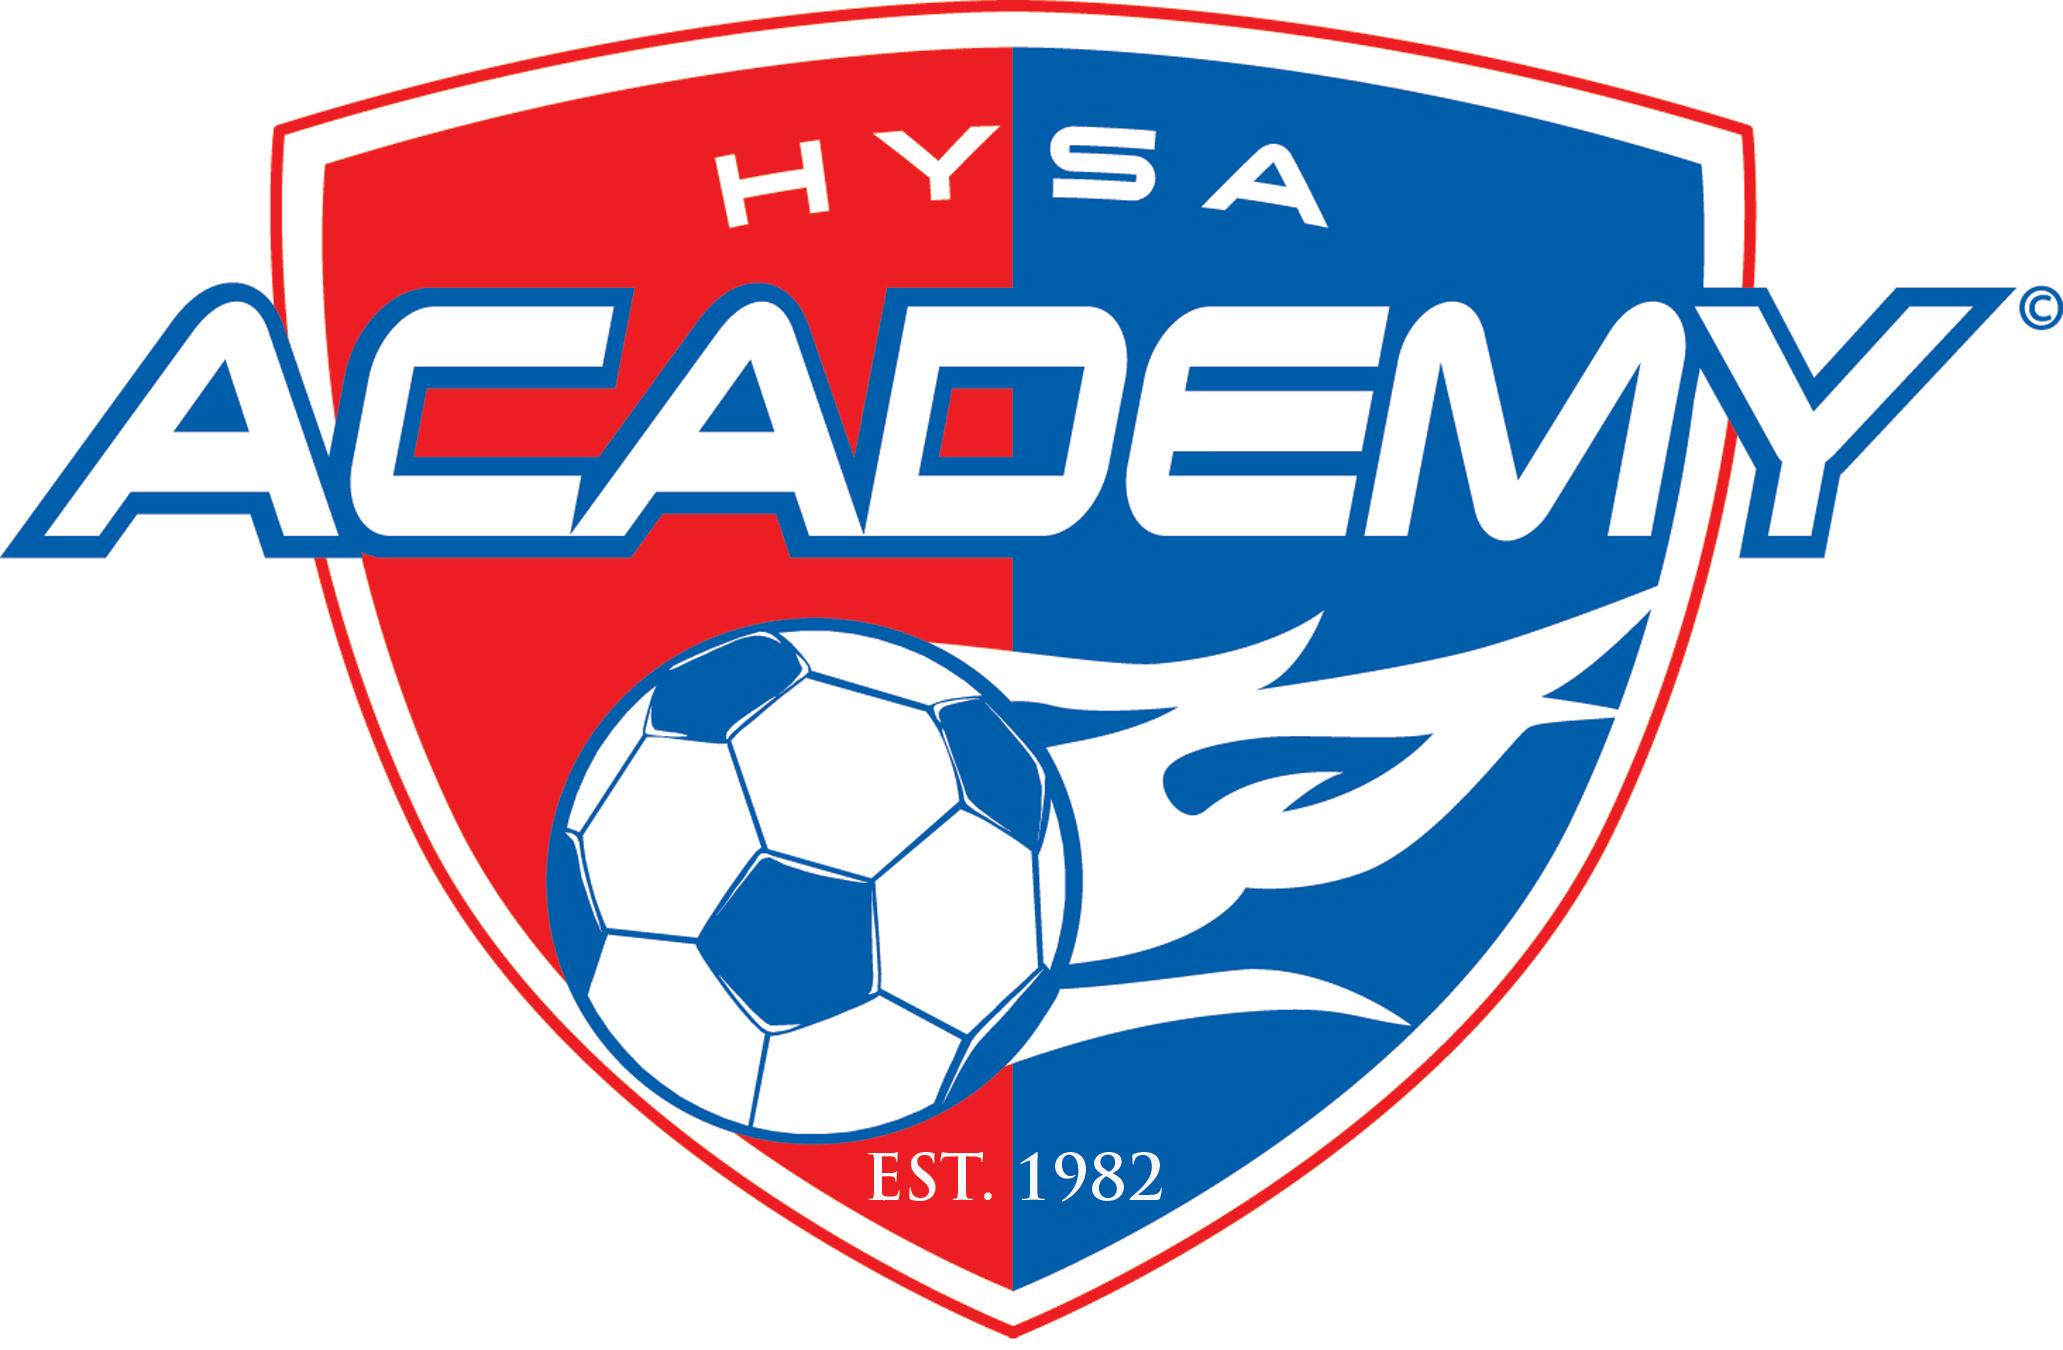 HYSA Academy